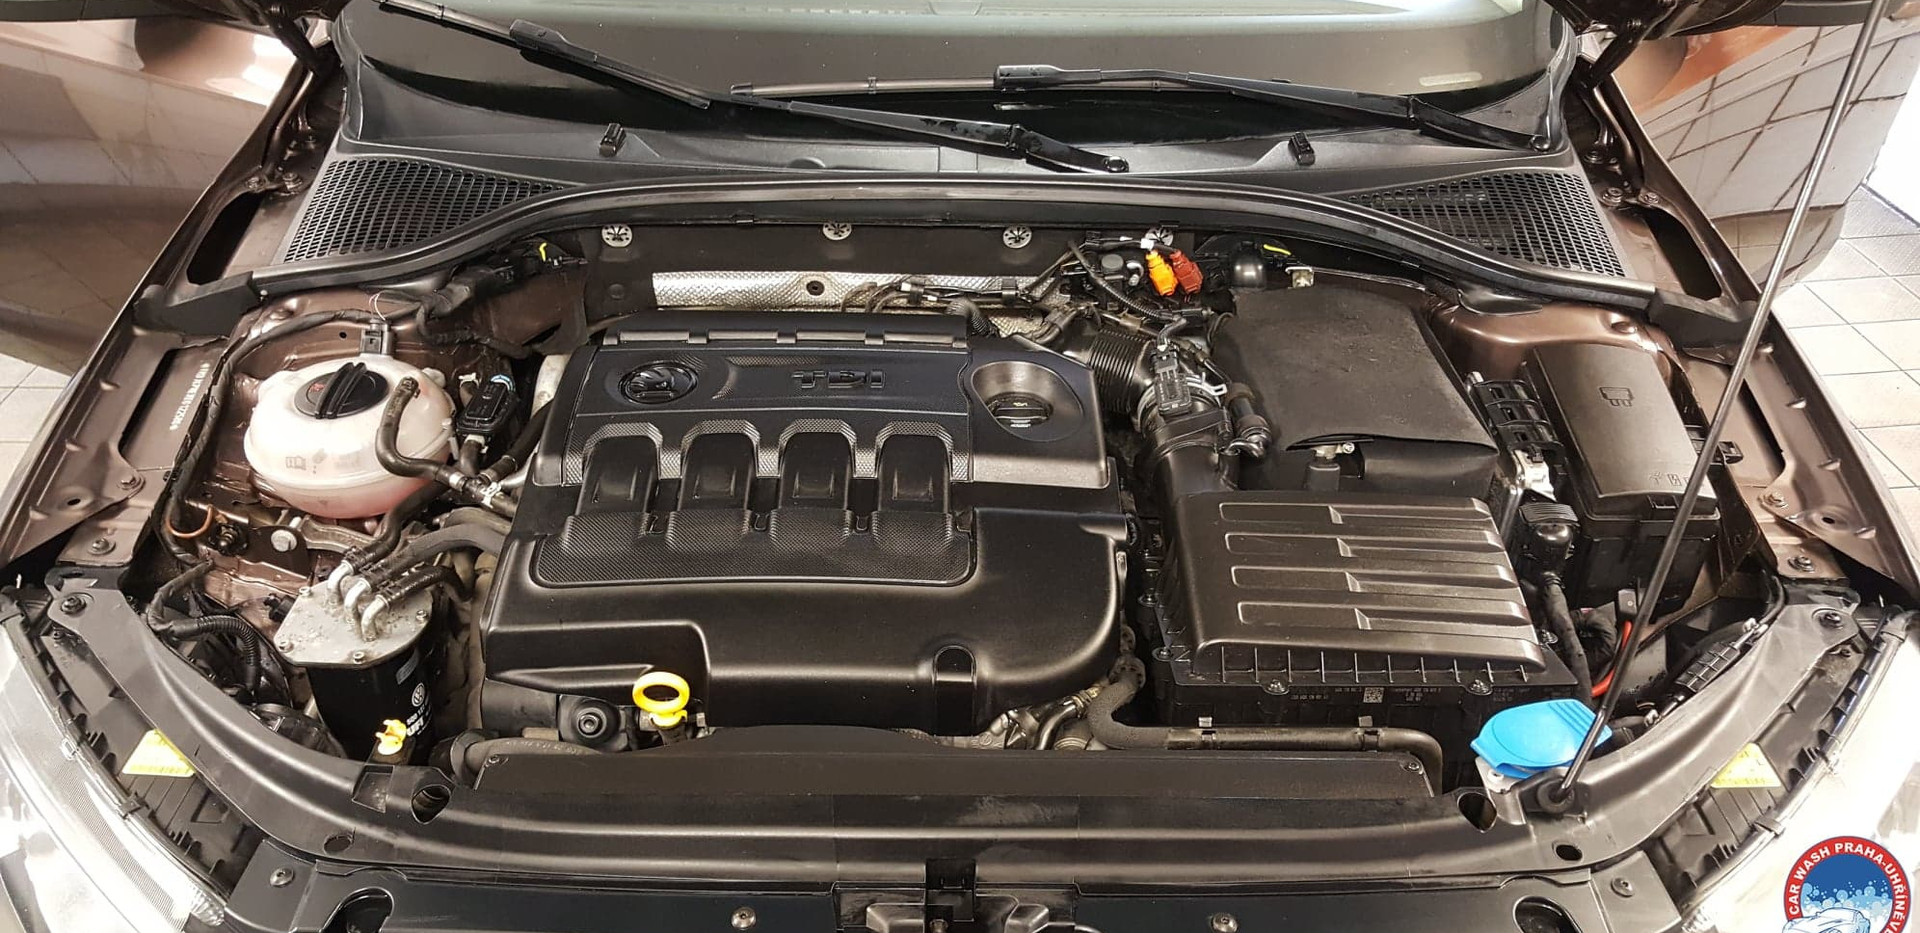 Car Wash - Cisteni motoru (21).jpg